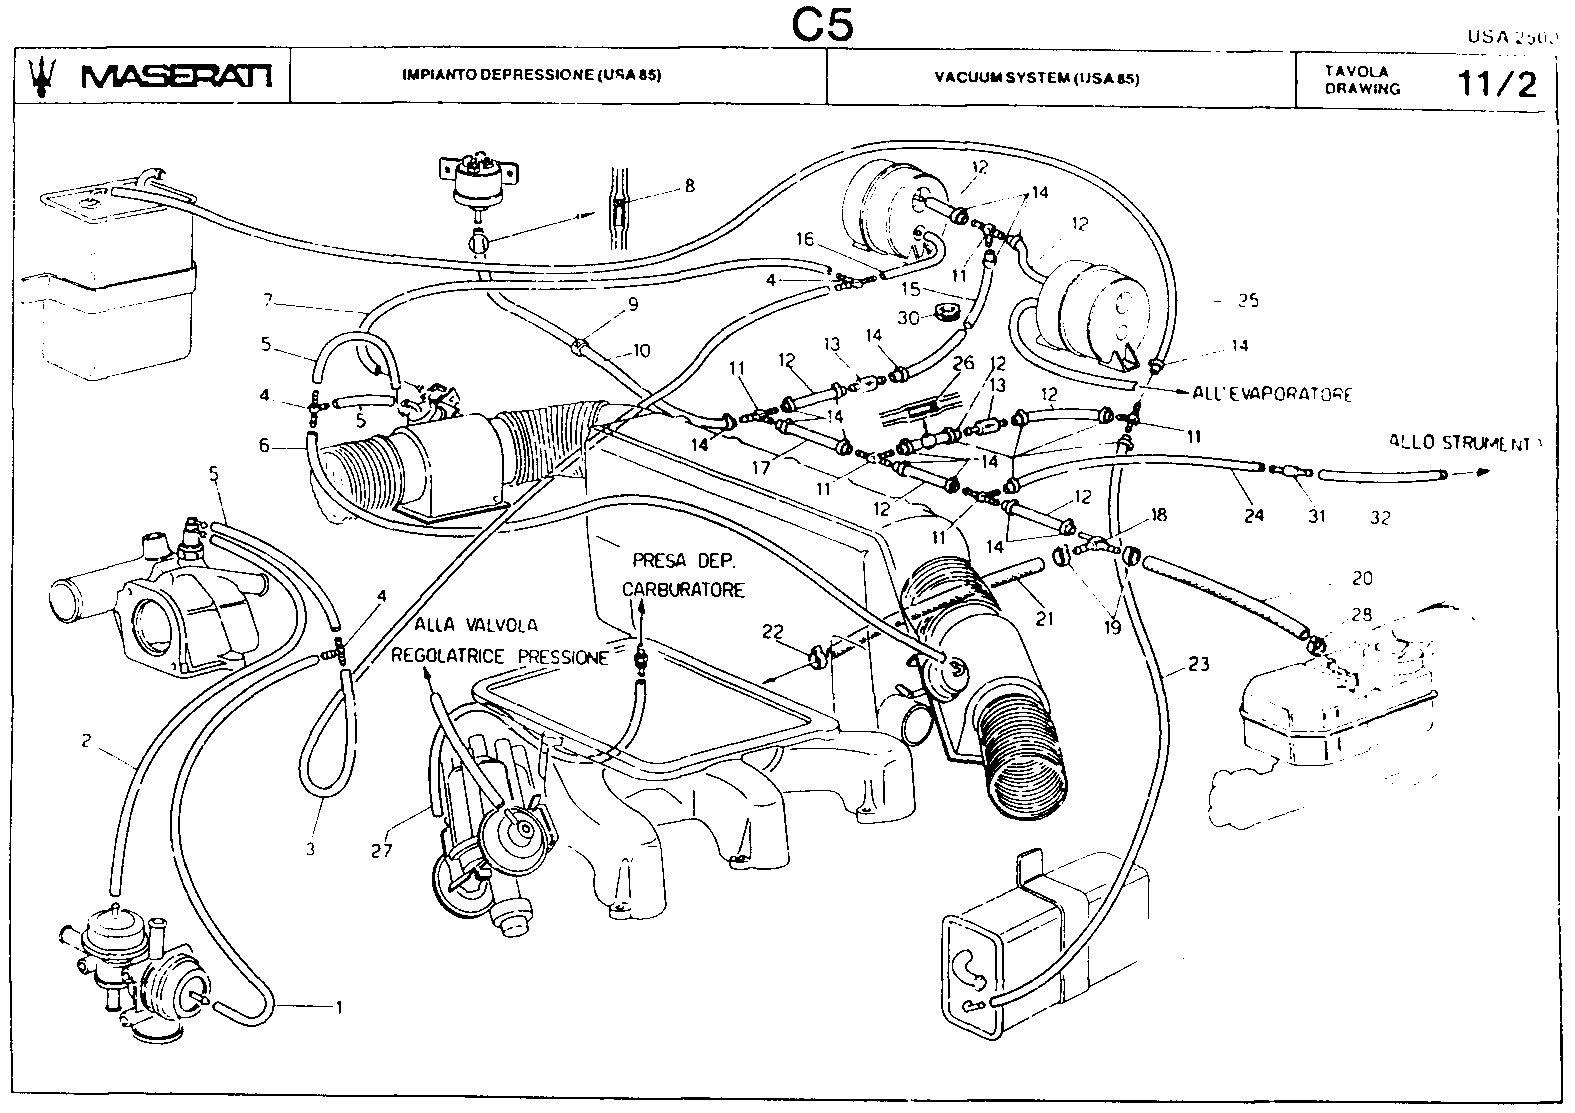 [KV_8827] Maserati Fuse Box Diagram Free Diagram